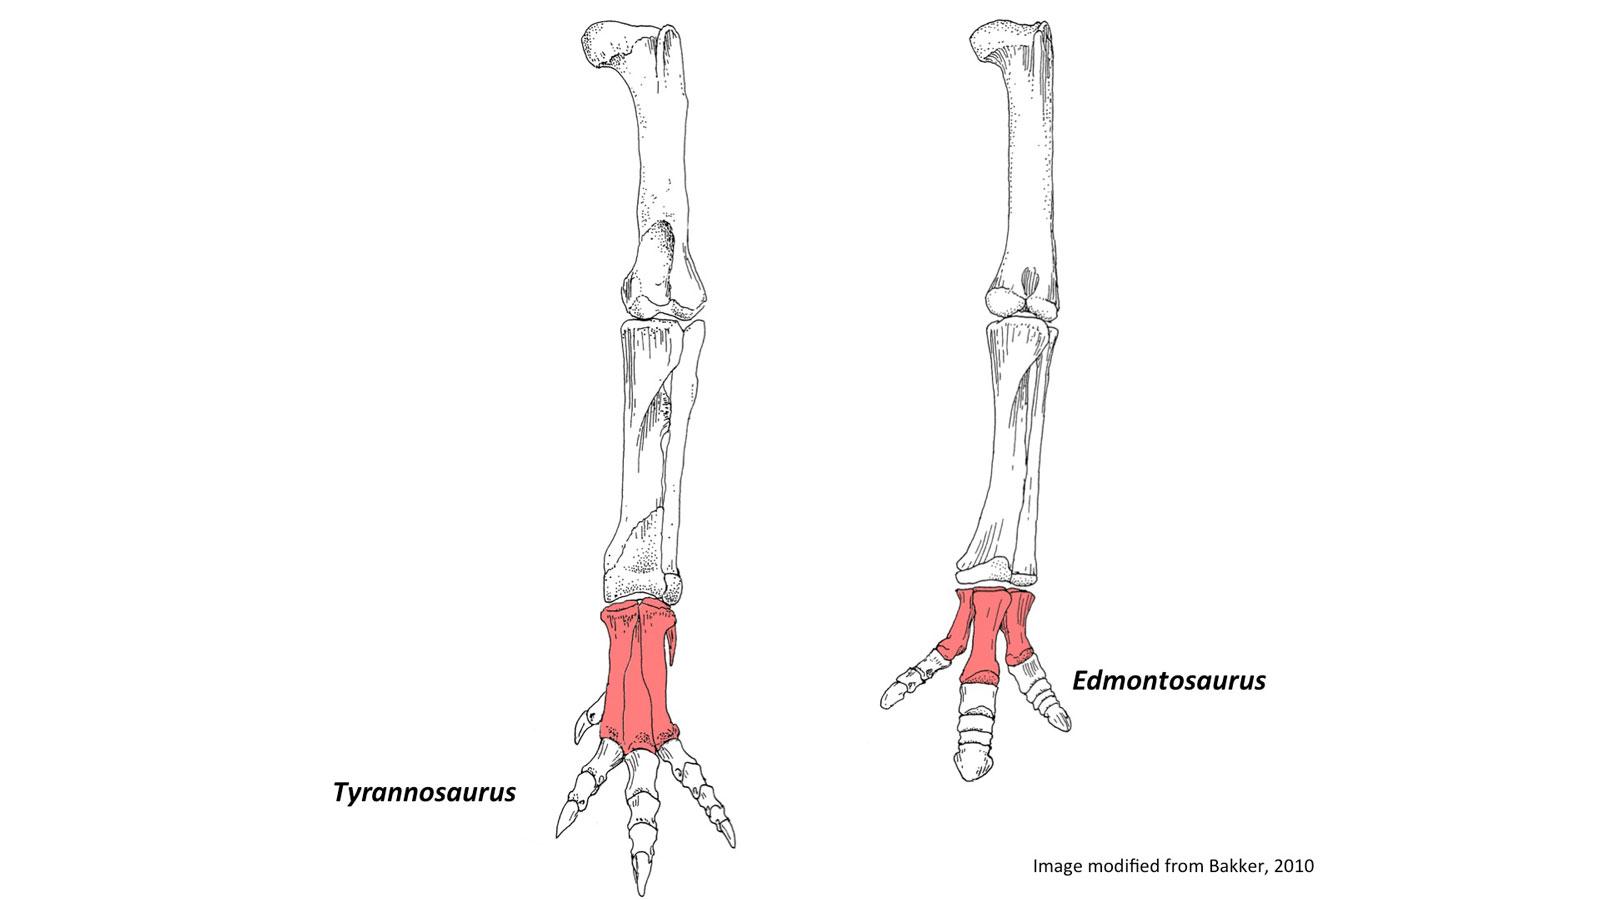 Comparison of Tyrannosaurus Rex and Albertosaurus metatarsal bones